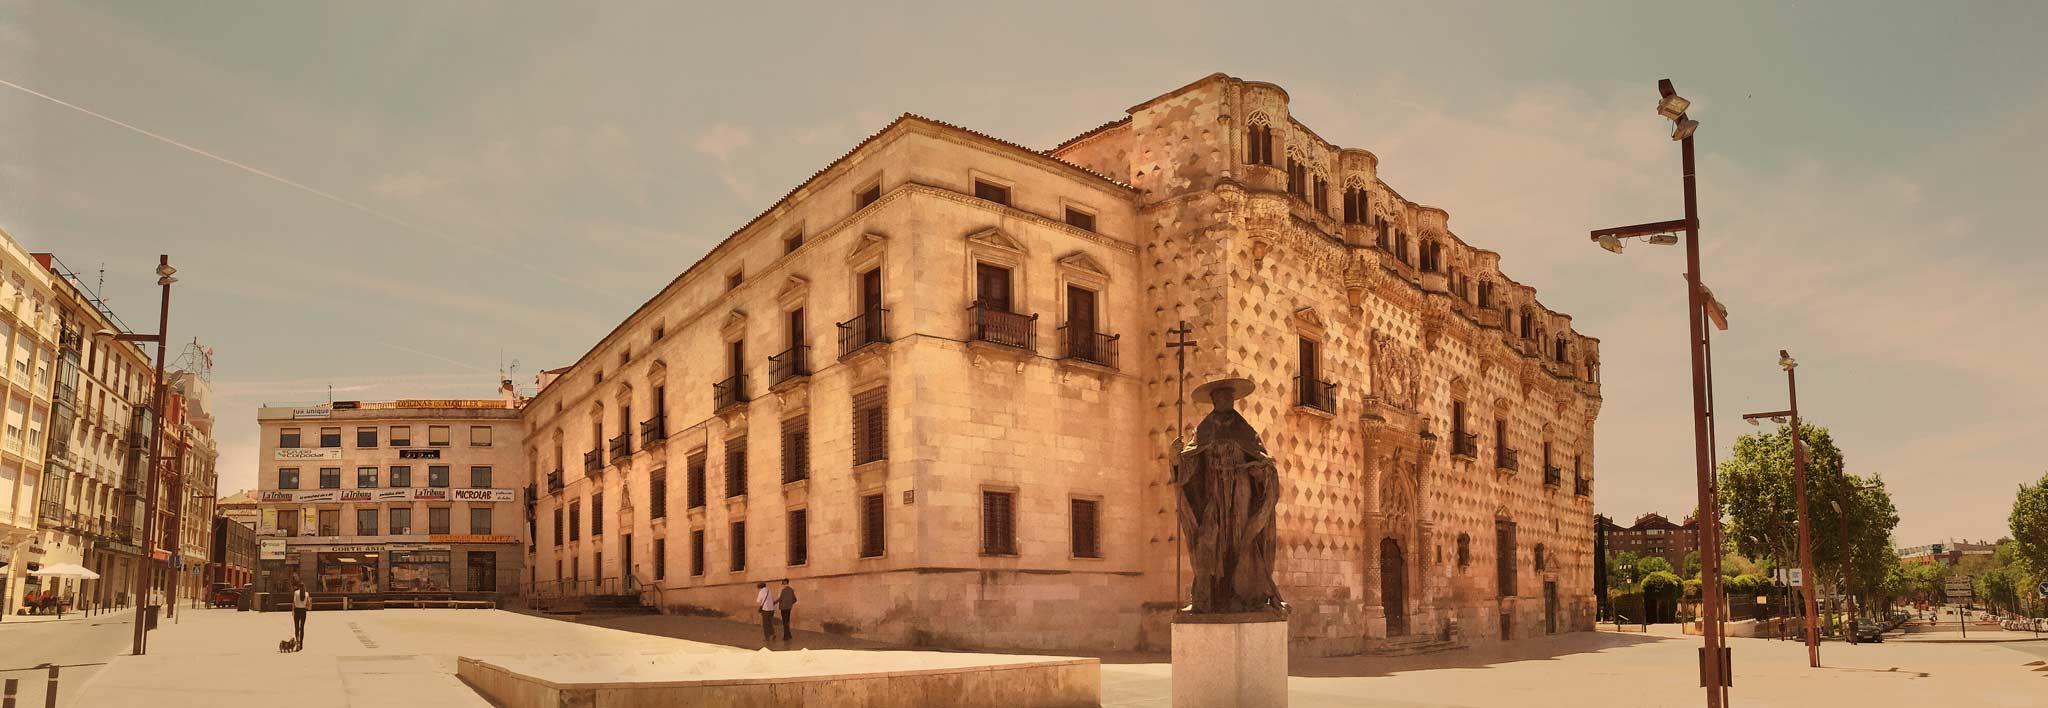 Agencia-SEO-de-Guadalajara-2020